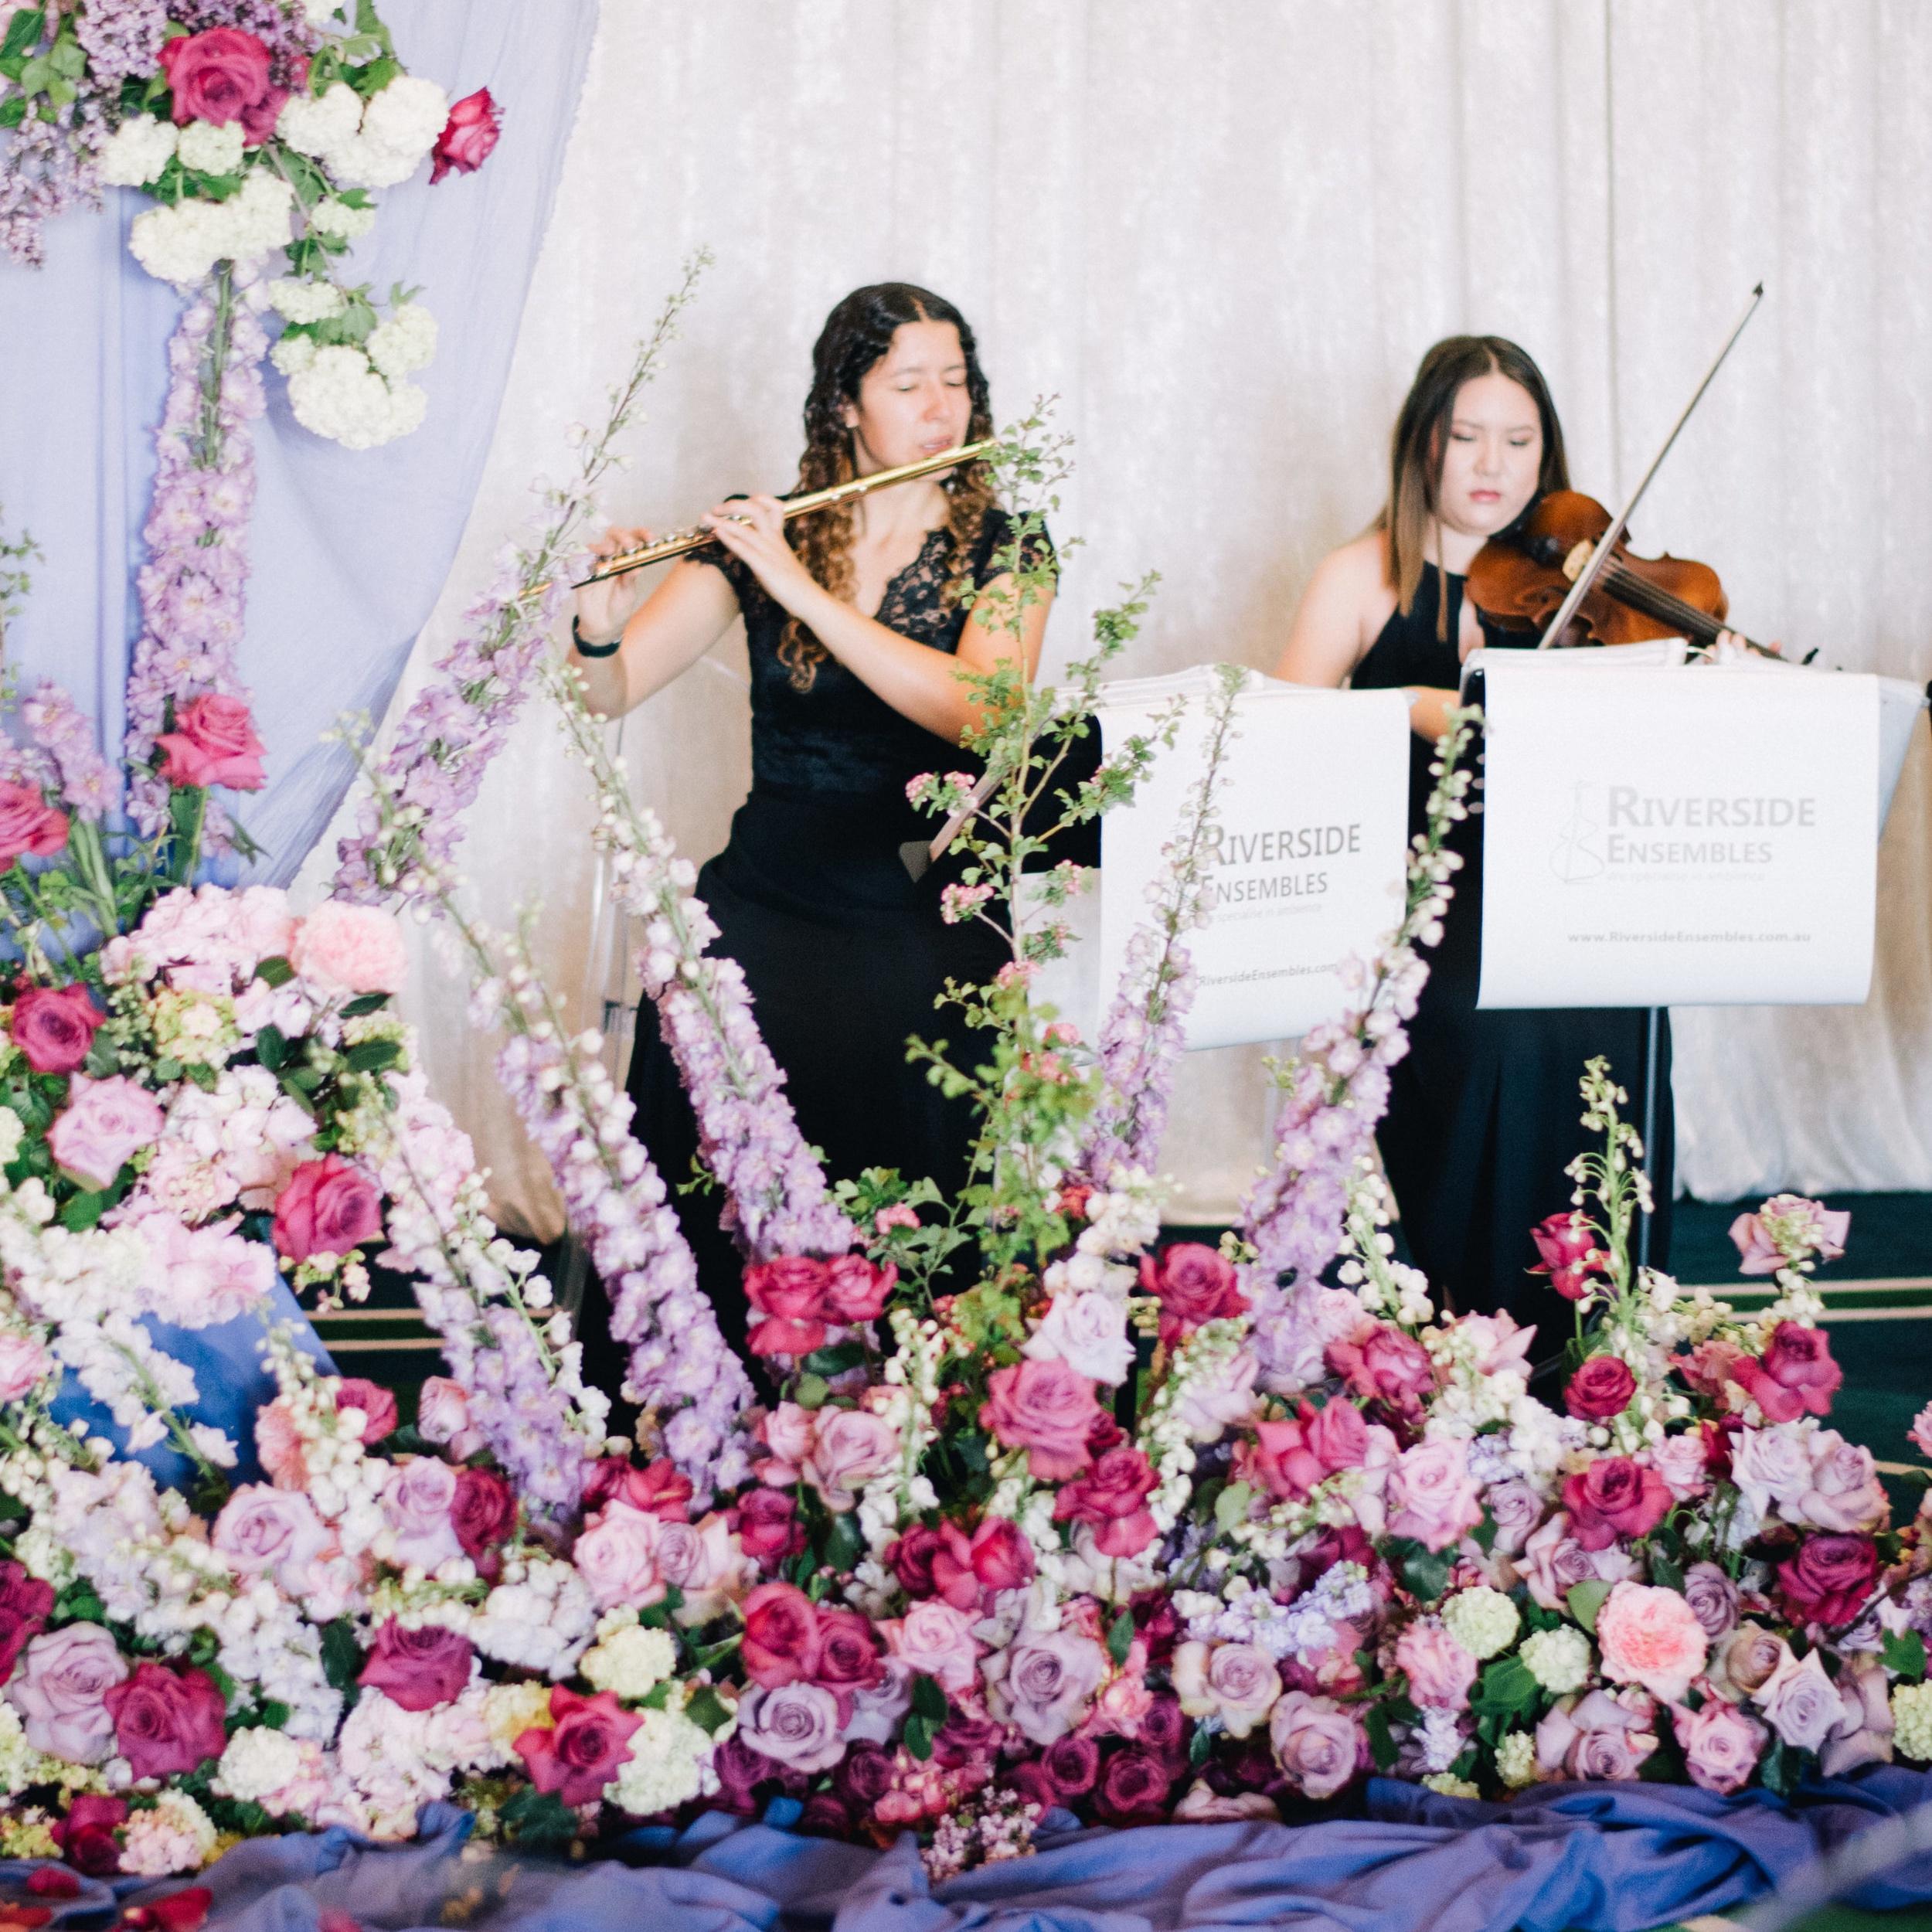 wedding-music-perth-string-quartet-flute-corporate-entertainment (6).jpg